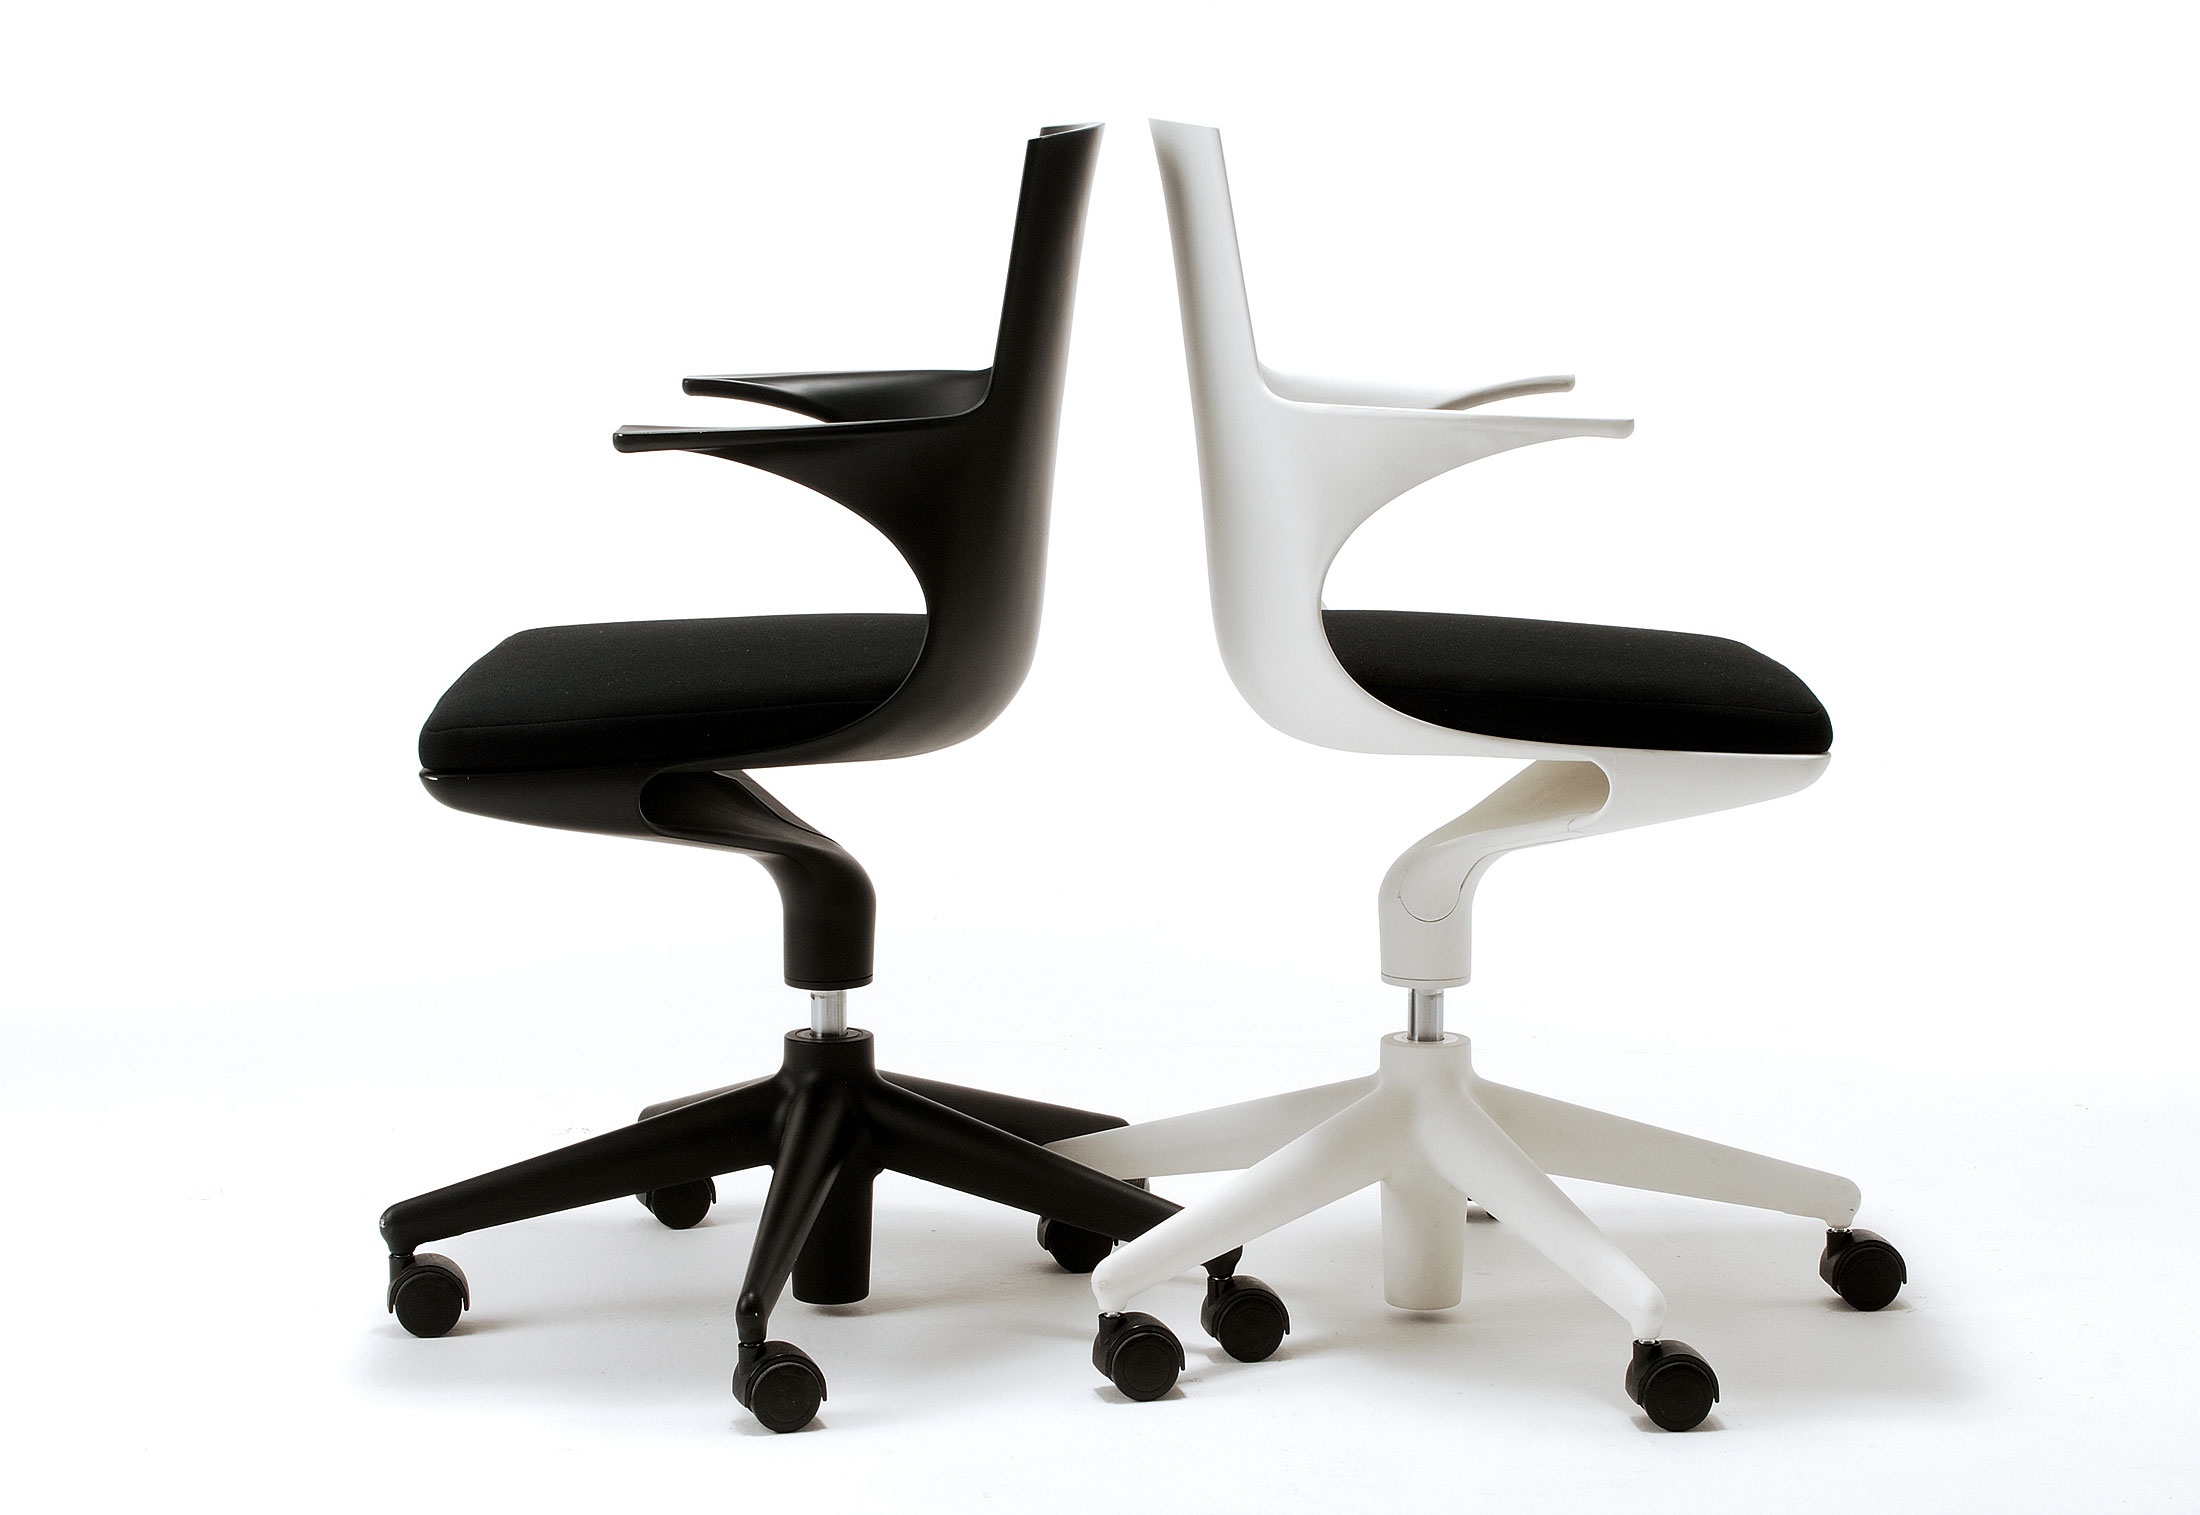 unico office chair. spoon chair; chair unico office r